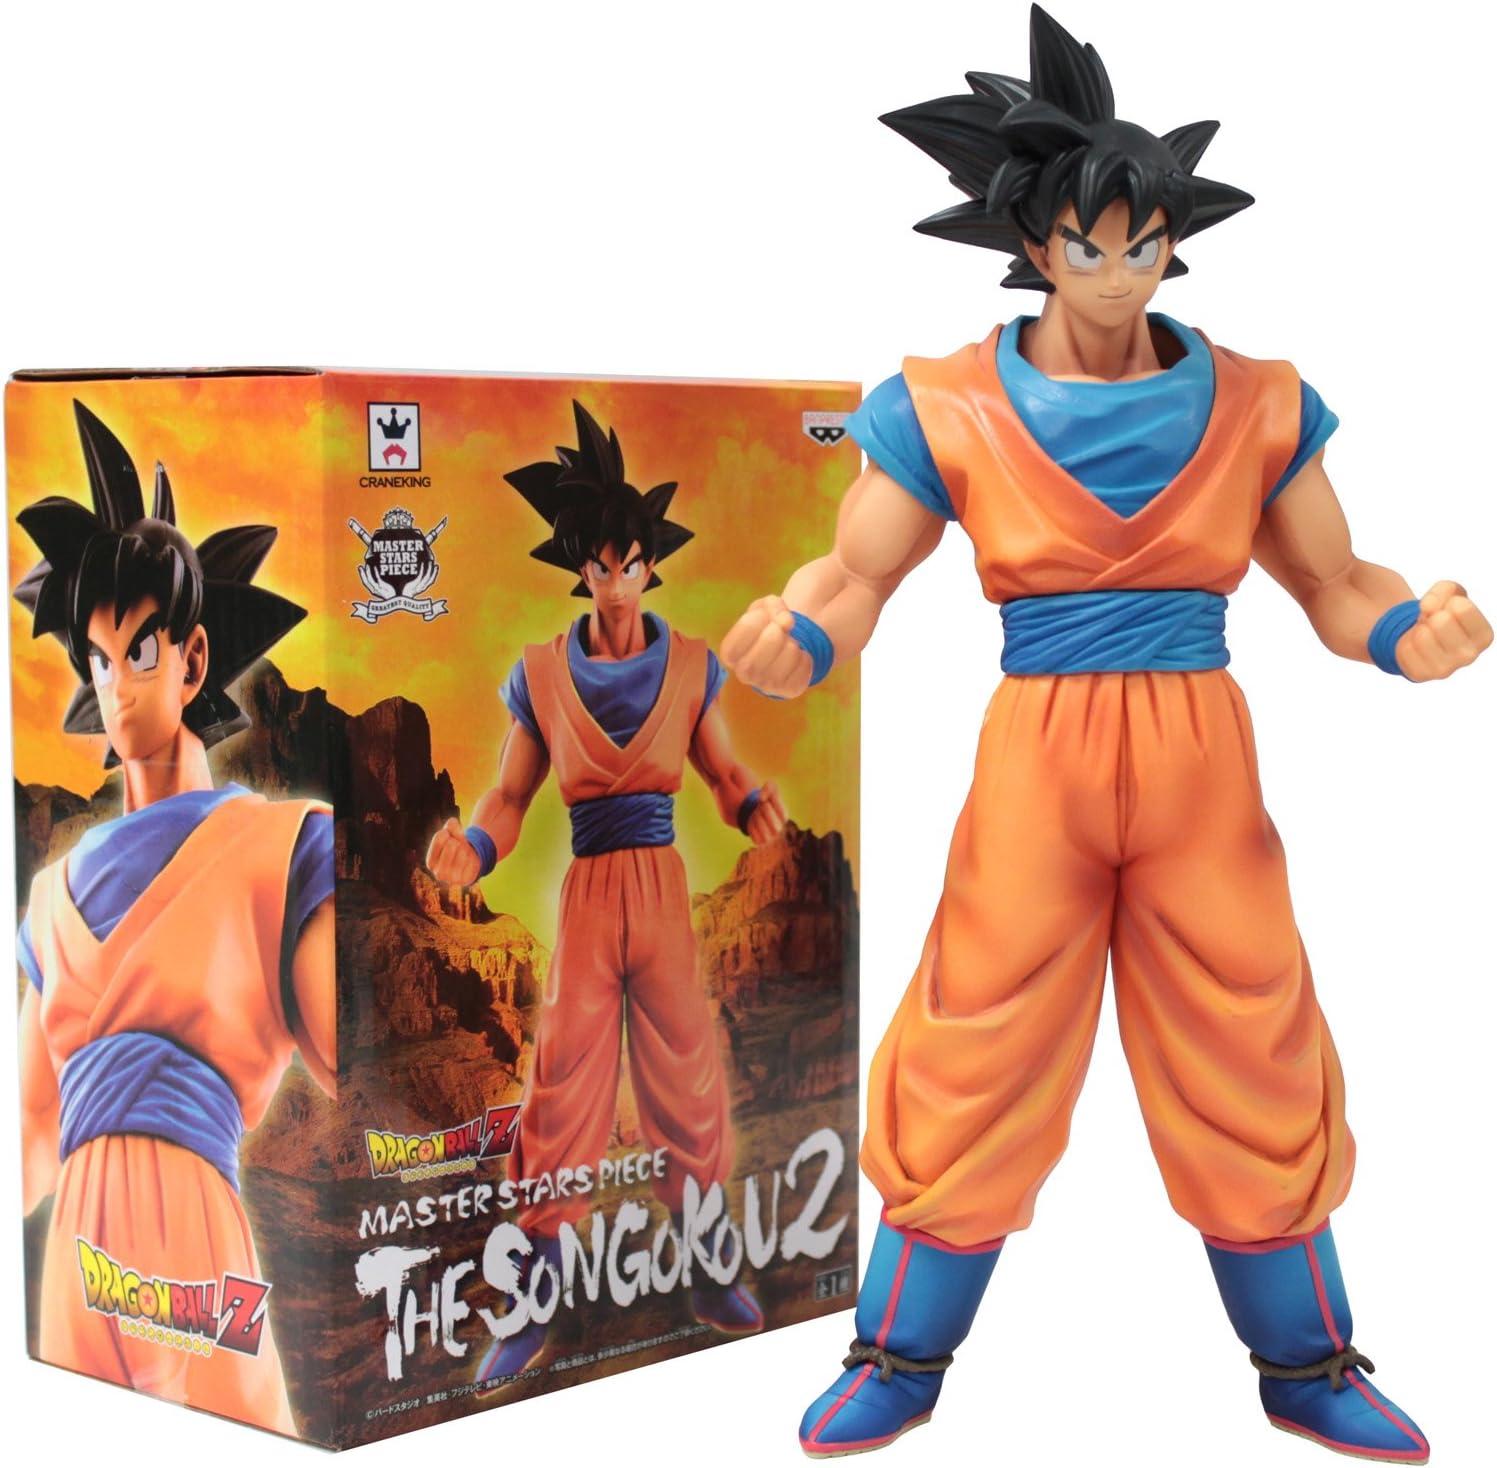 Dragon Ball Z DBZ Figure S.SAIYAN SON GOKU MSP Master Stars Piece Banpresto NEW